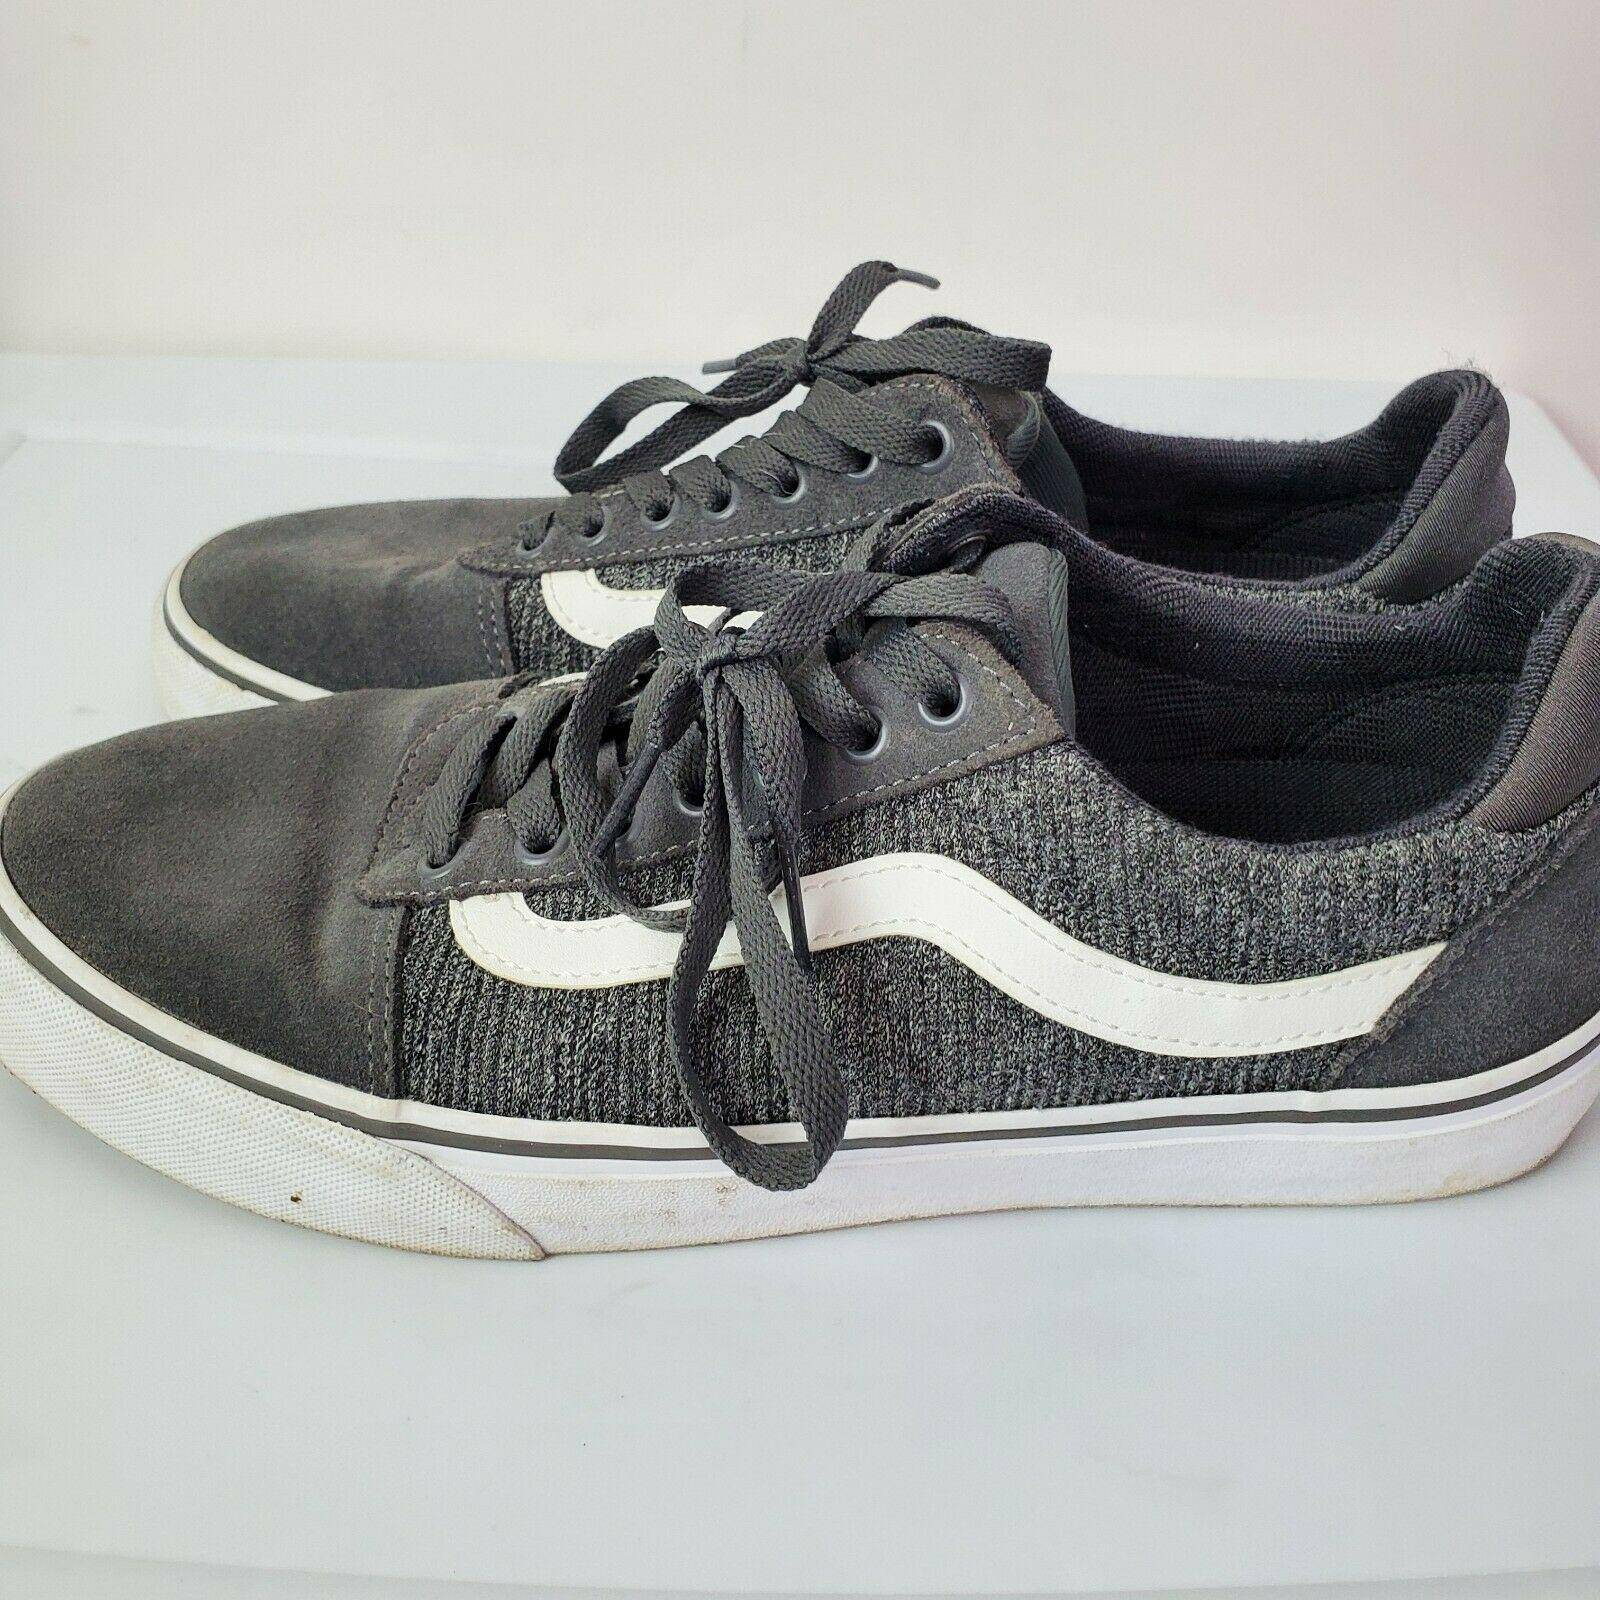 Vans Vans Ortholite Deluxe Comfort Gray Skate Shoes